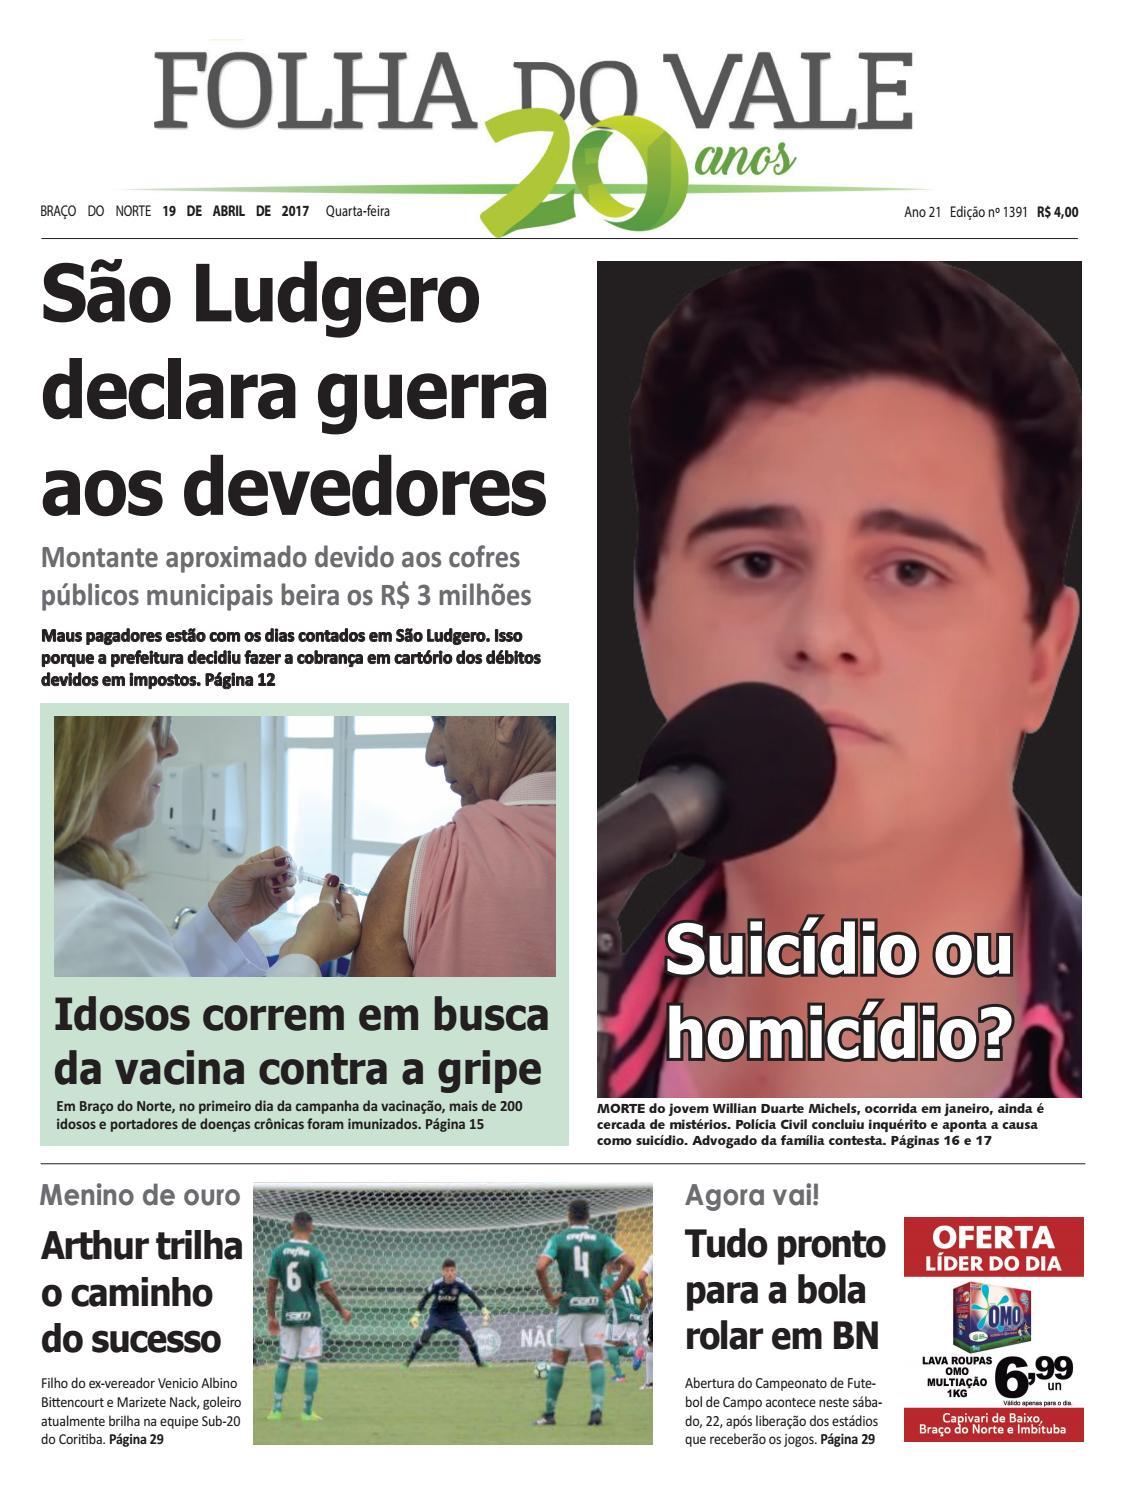 d97282db460 1391 by Folha do Vale - issuu